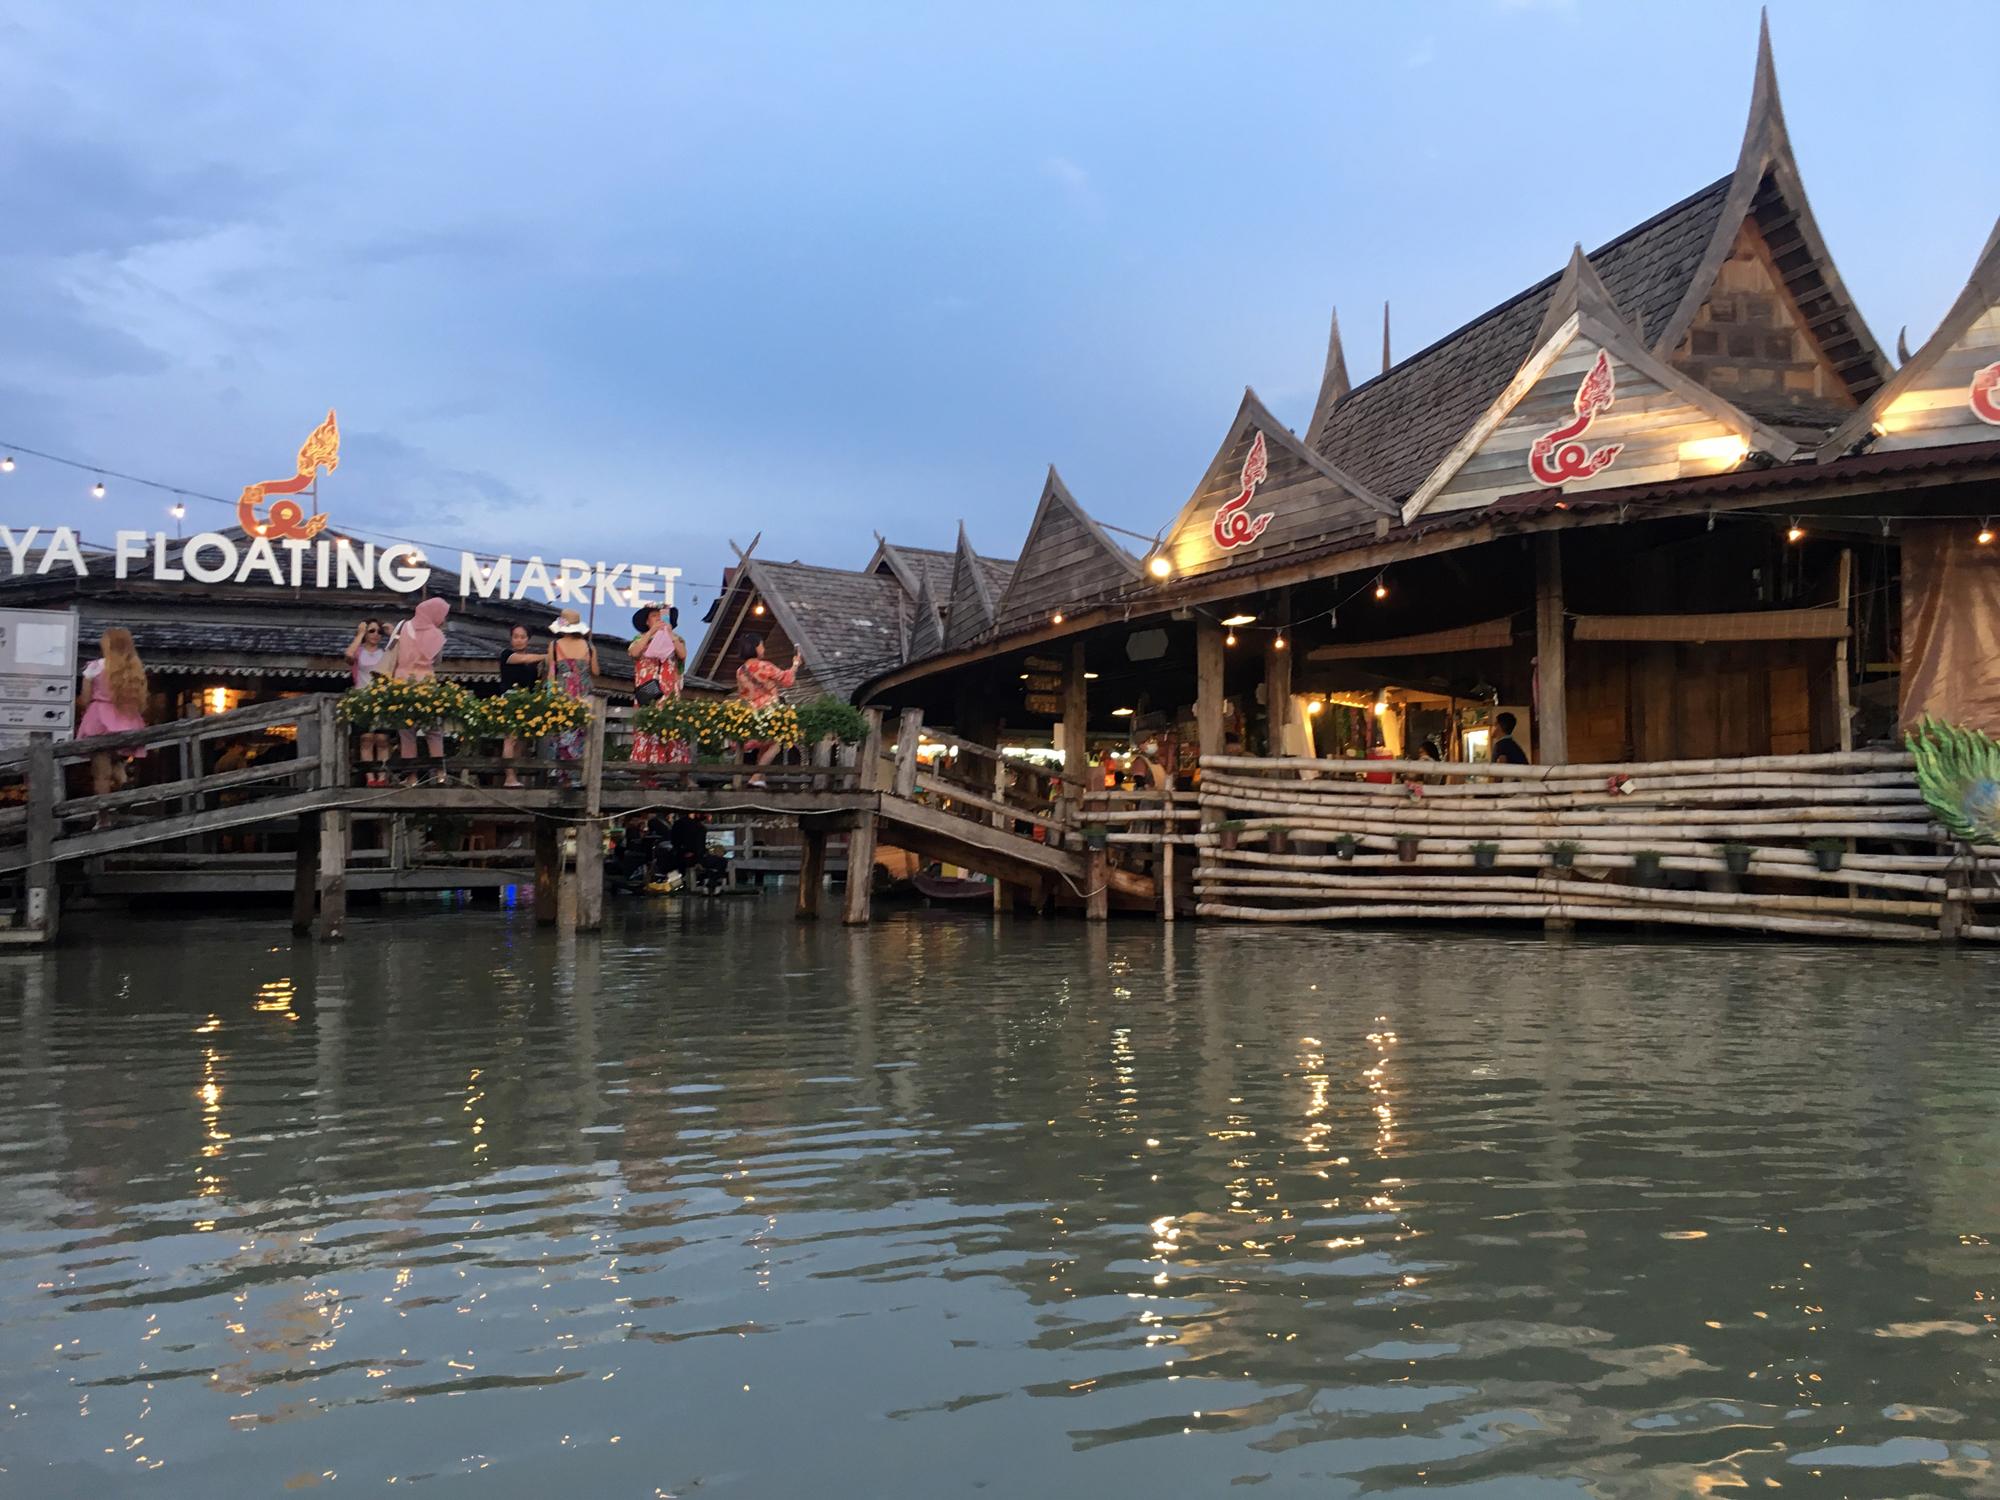 Pattaya - floating market - things to do in Pattaya